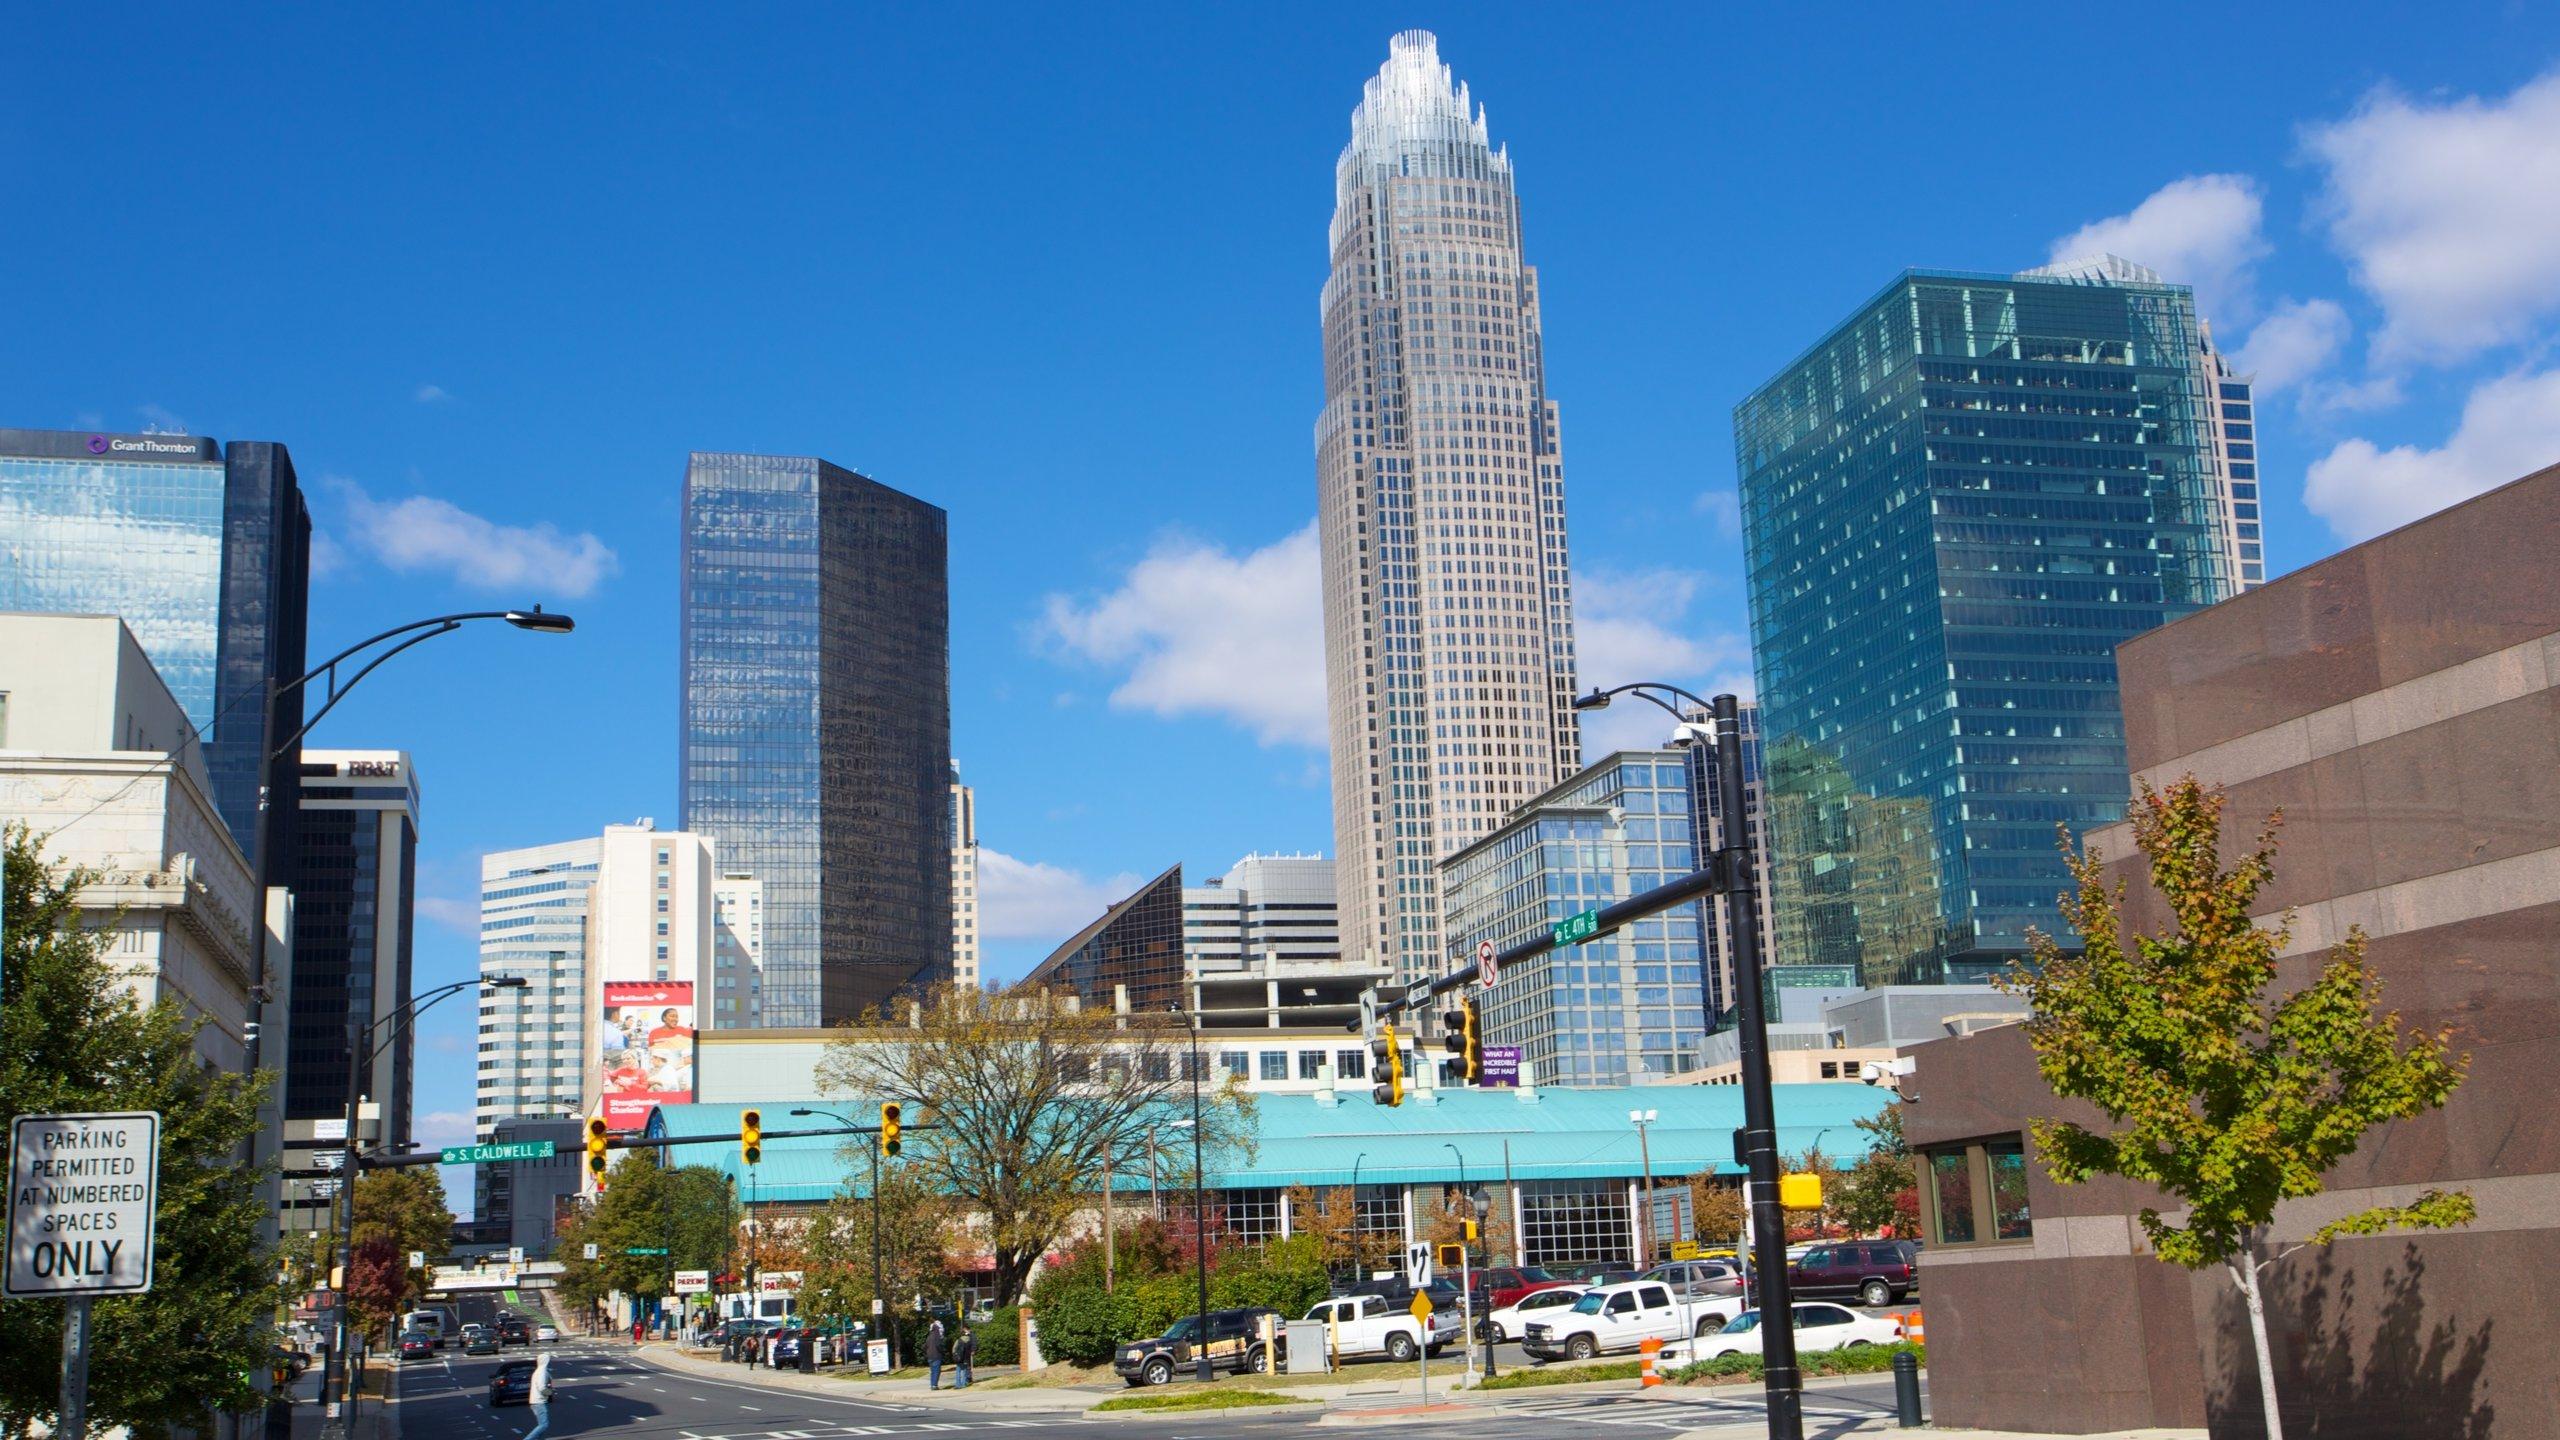 Charlotte, North Carolina, United States of America